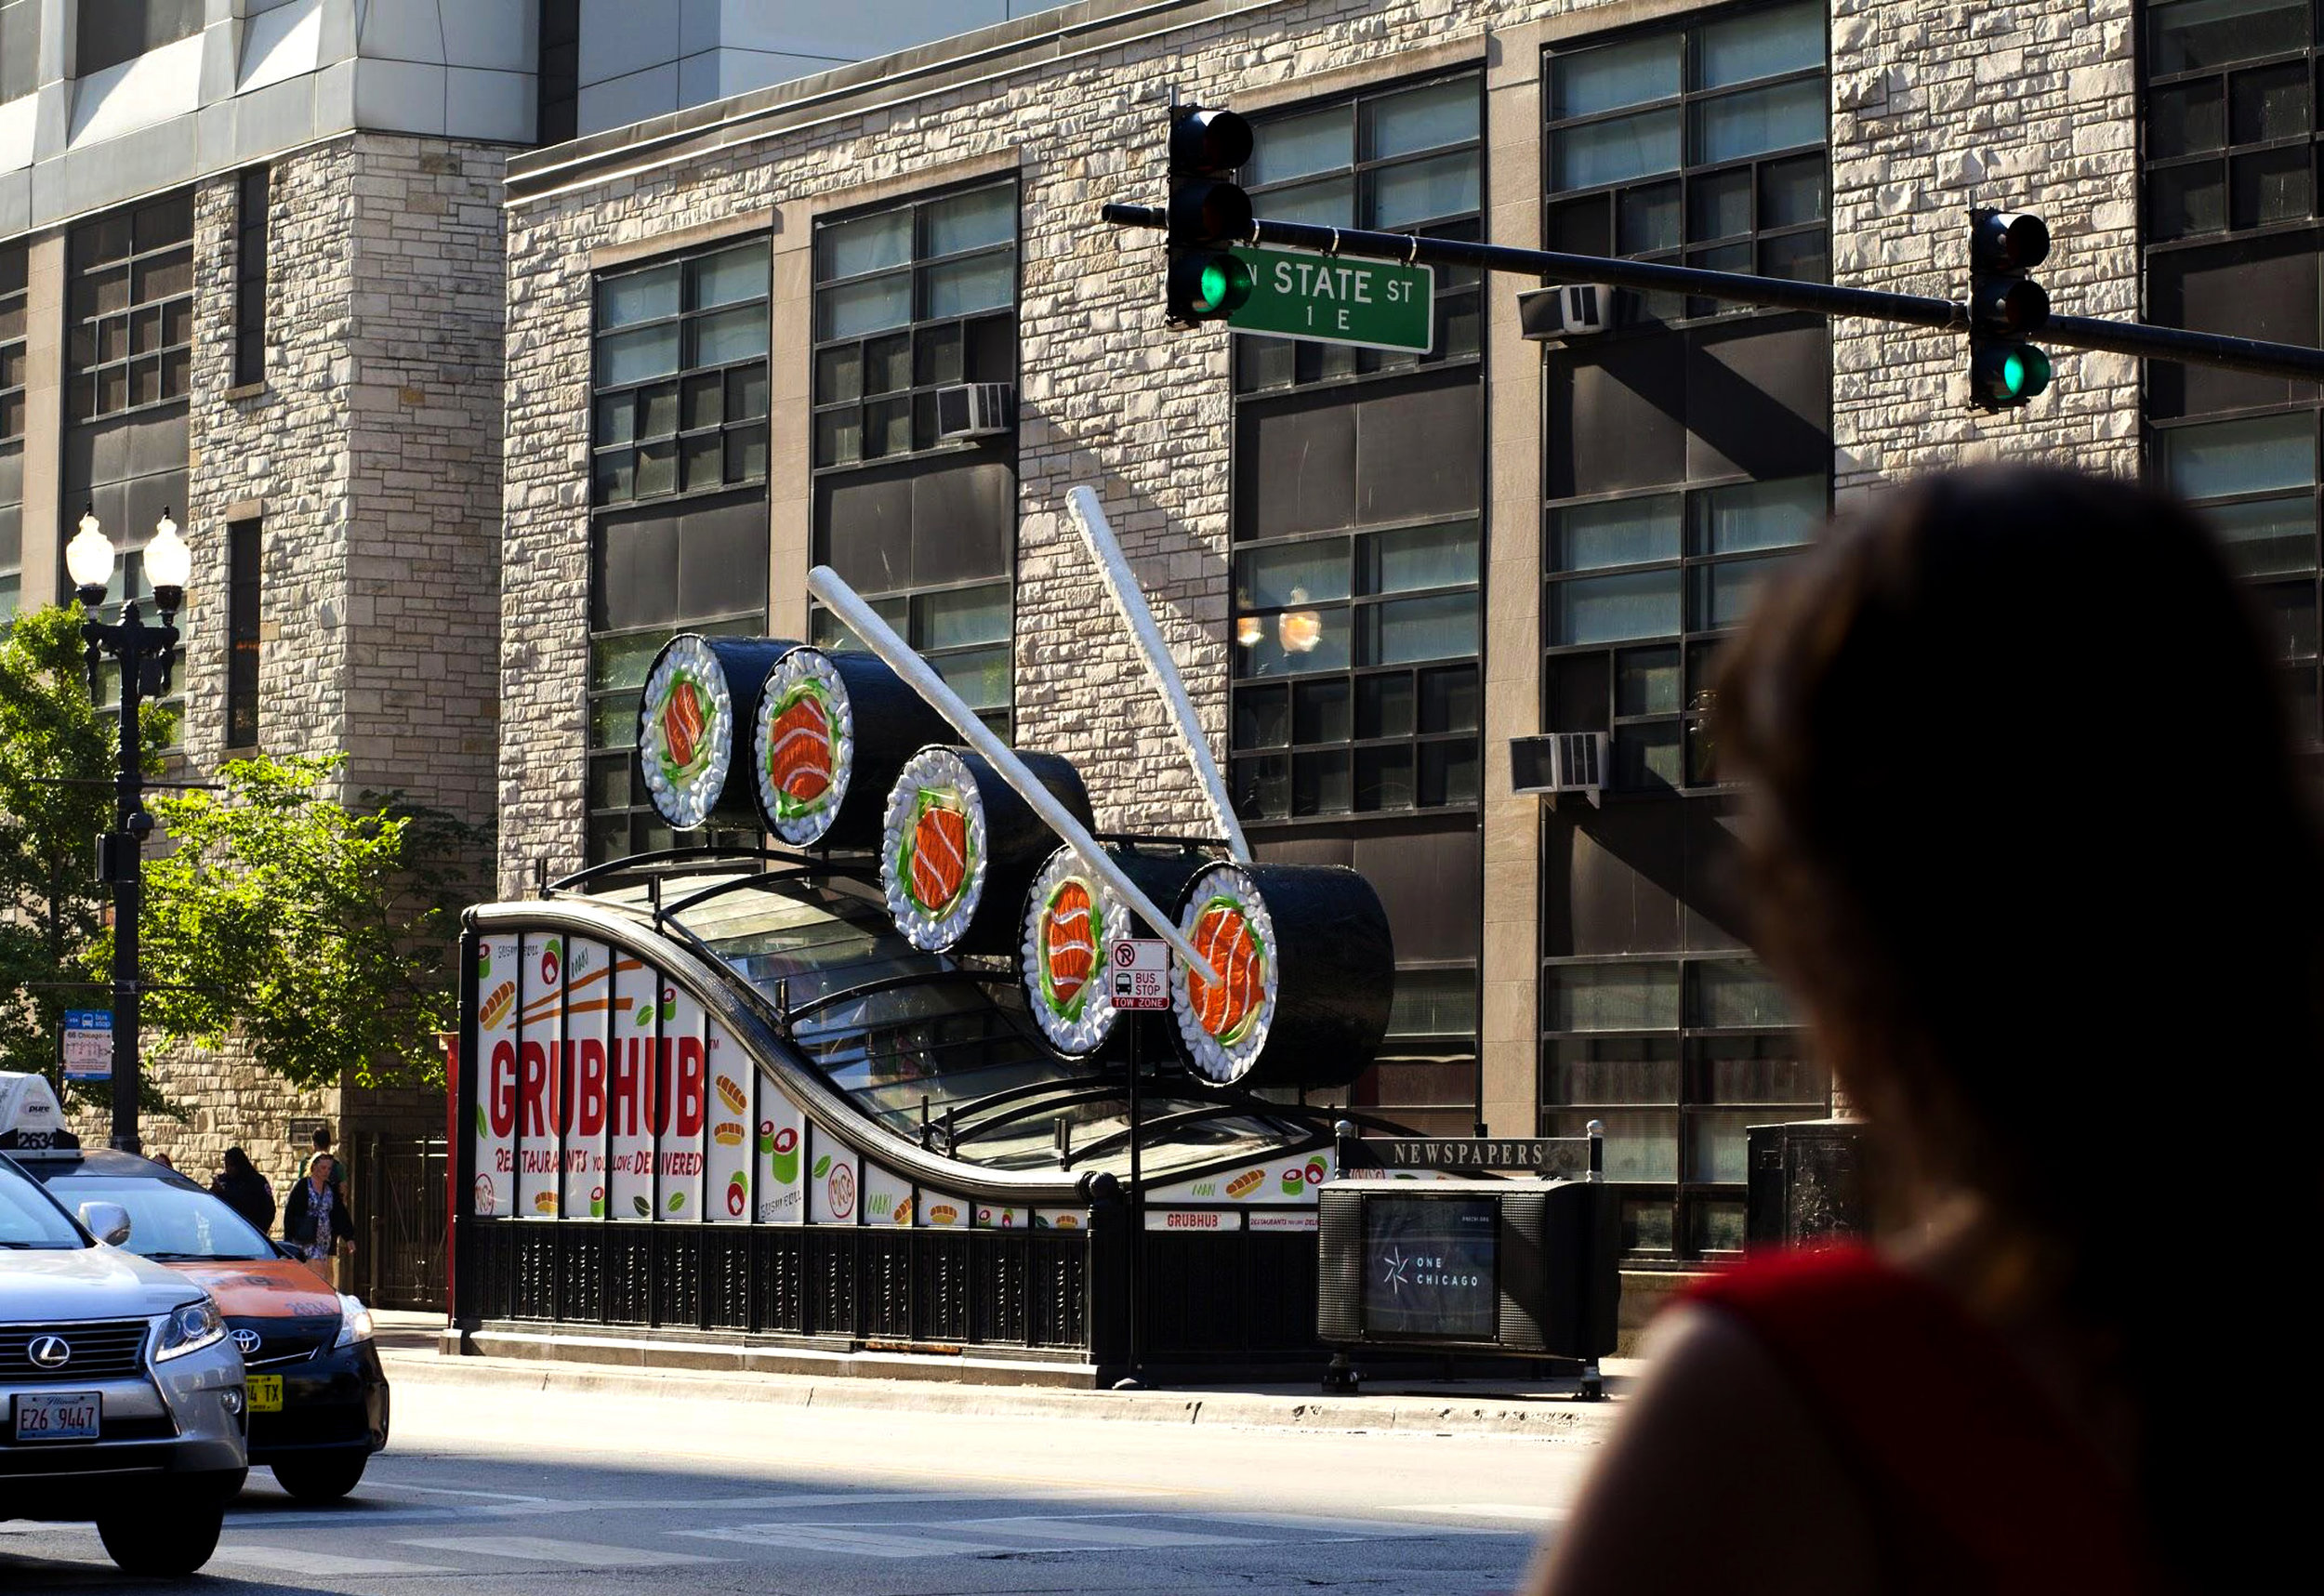 Chicago-CTA-Station-Domination-Grubhub-Sushi-3-1.jpg